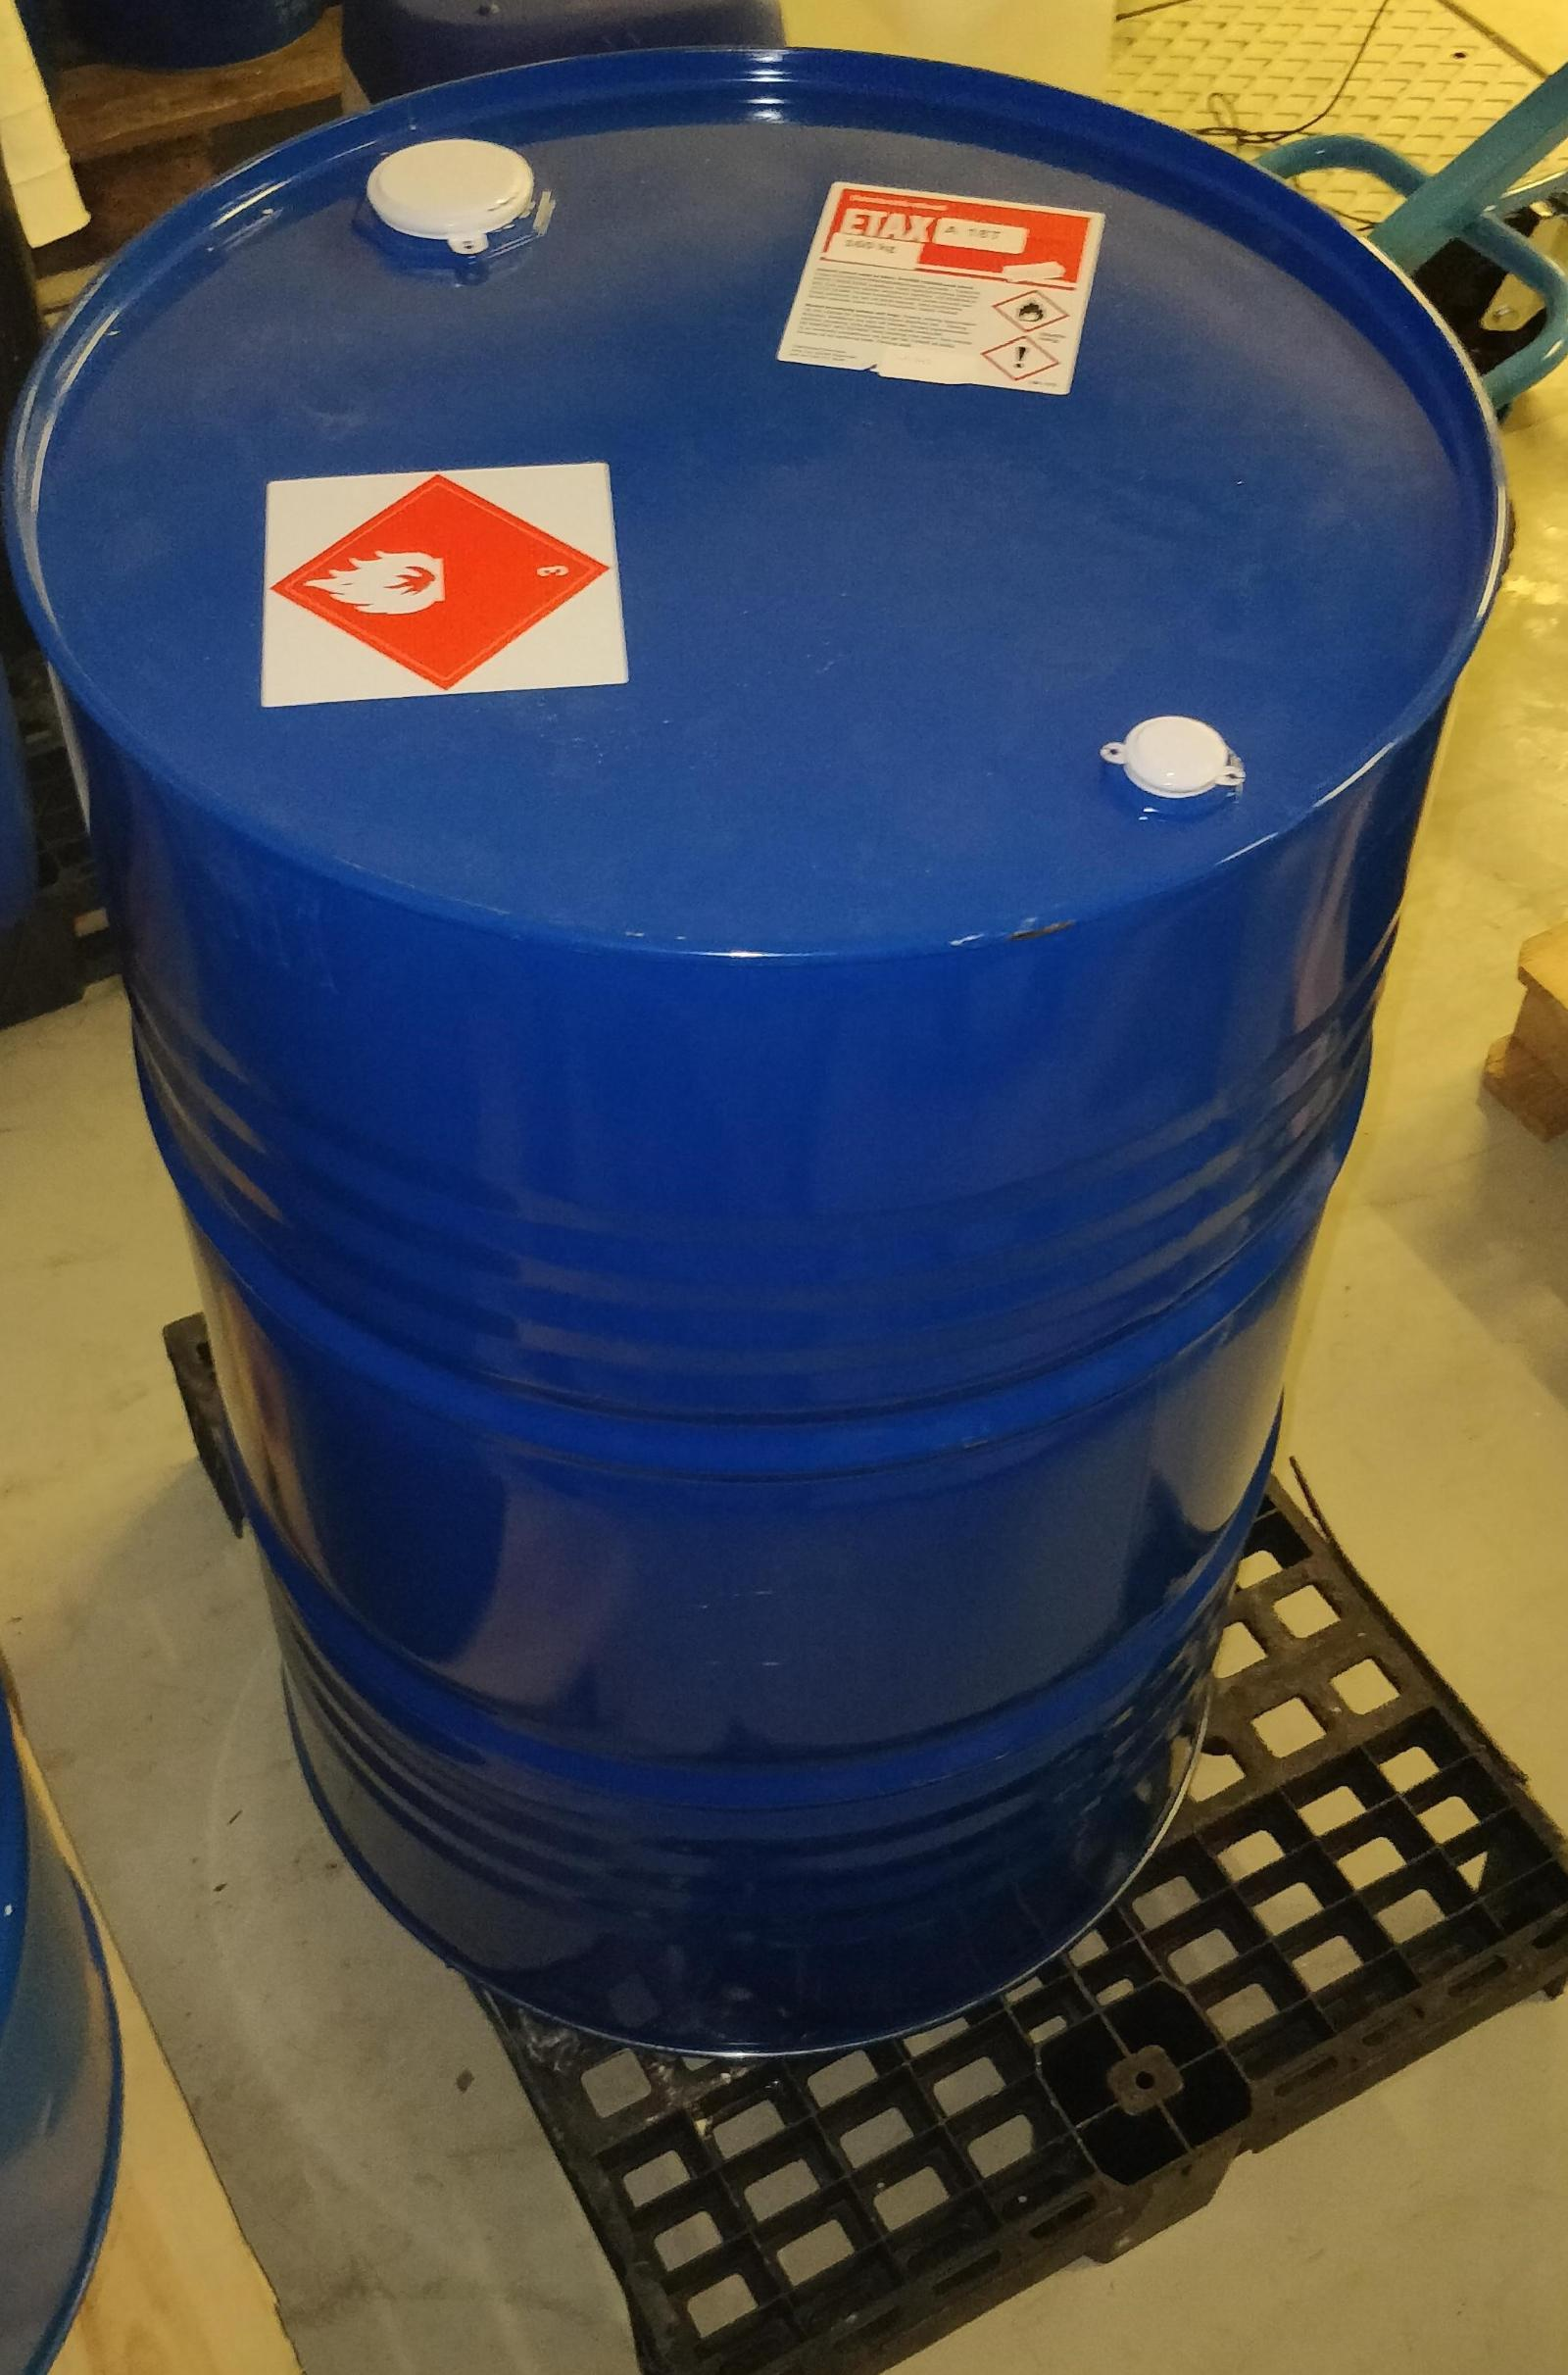 Denatured Ethanol 3650 L & 180 L and Glycerol ~400 L & 40 L // Used for Hand Sanitizers (4,270 Litres)